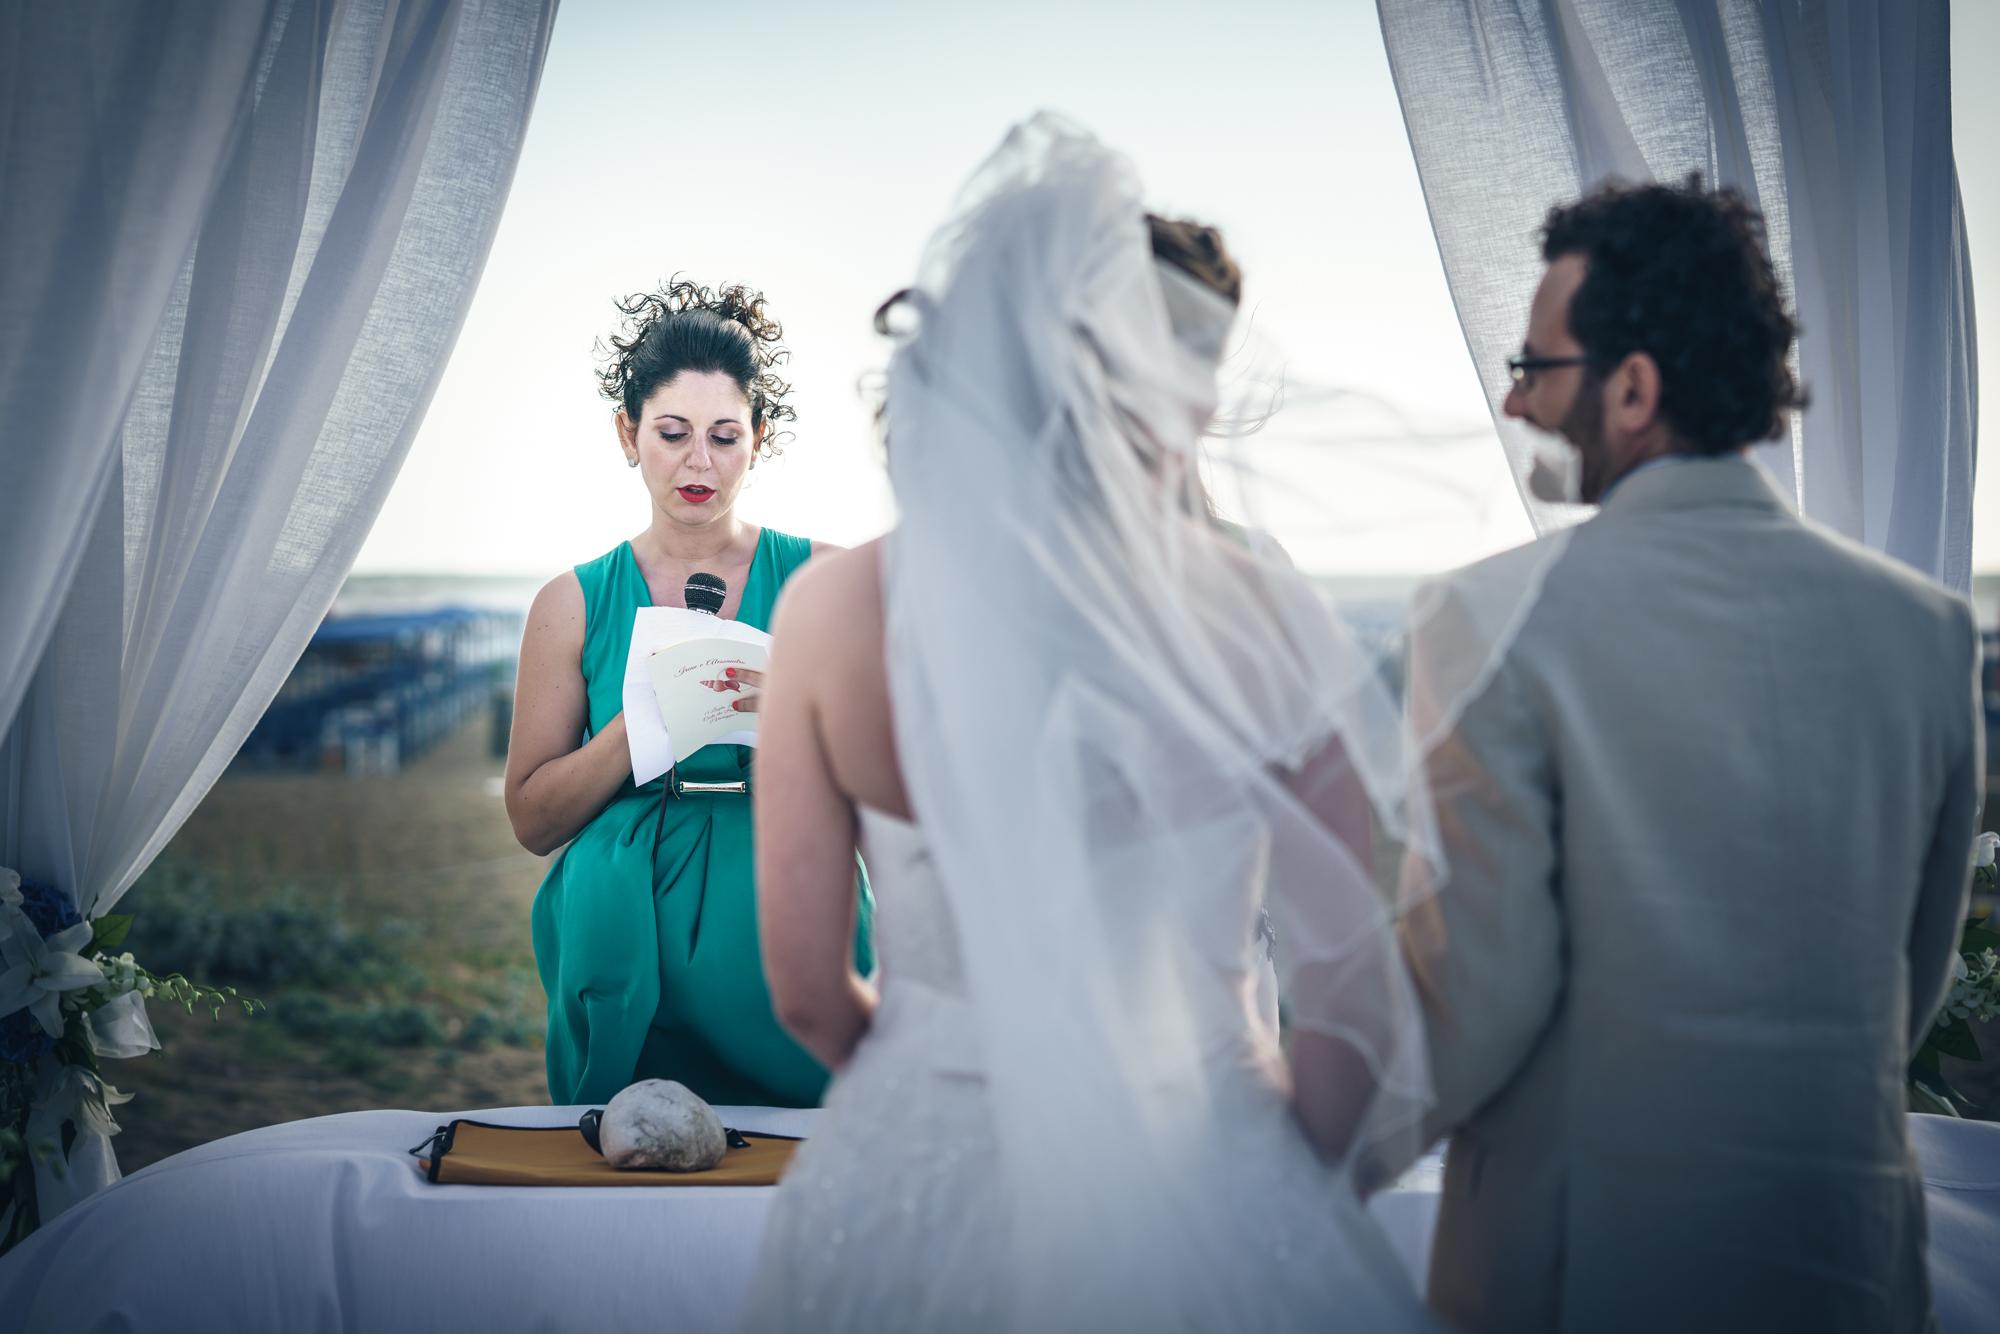 Matrimonio Spiaggia Viareggio : Fotografo matrimonio viareggio costa dei barbari